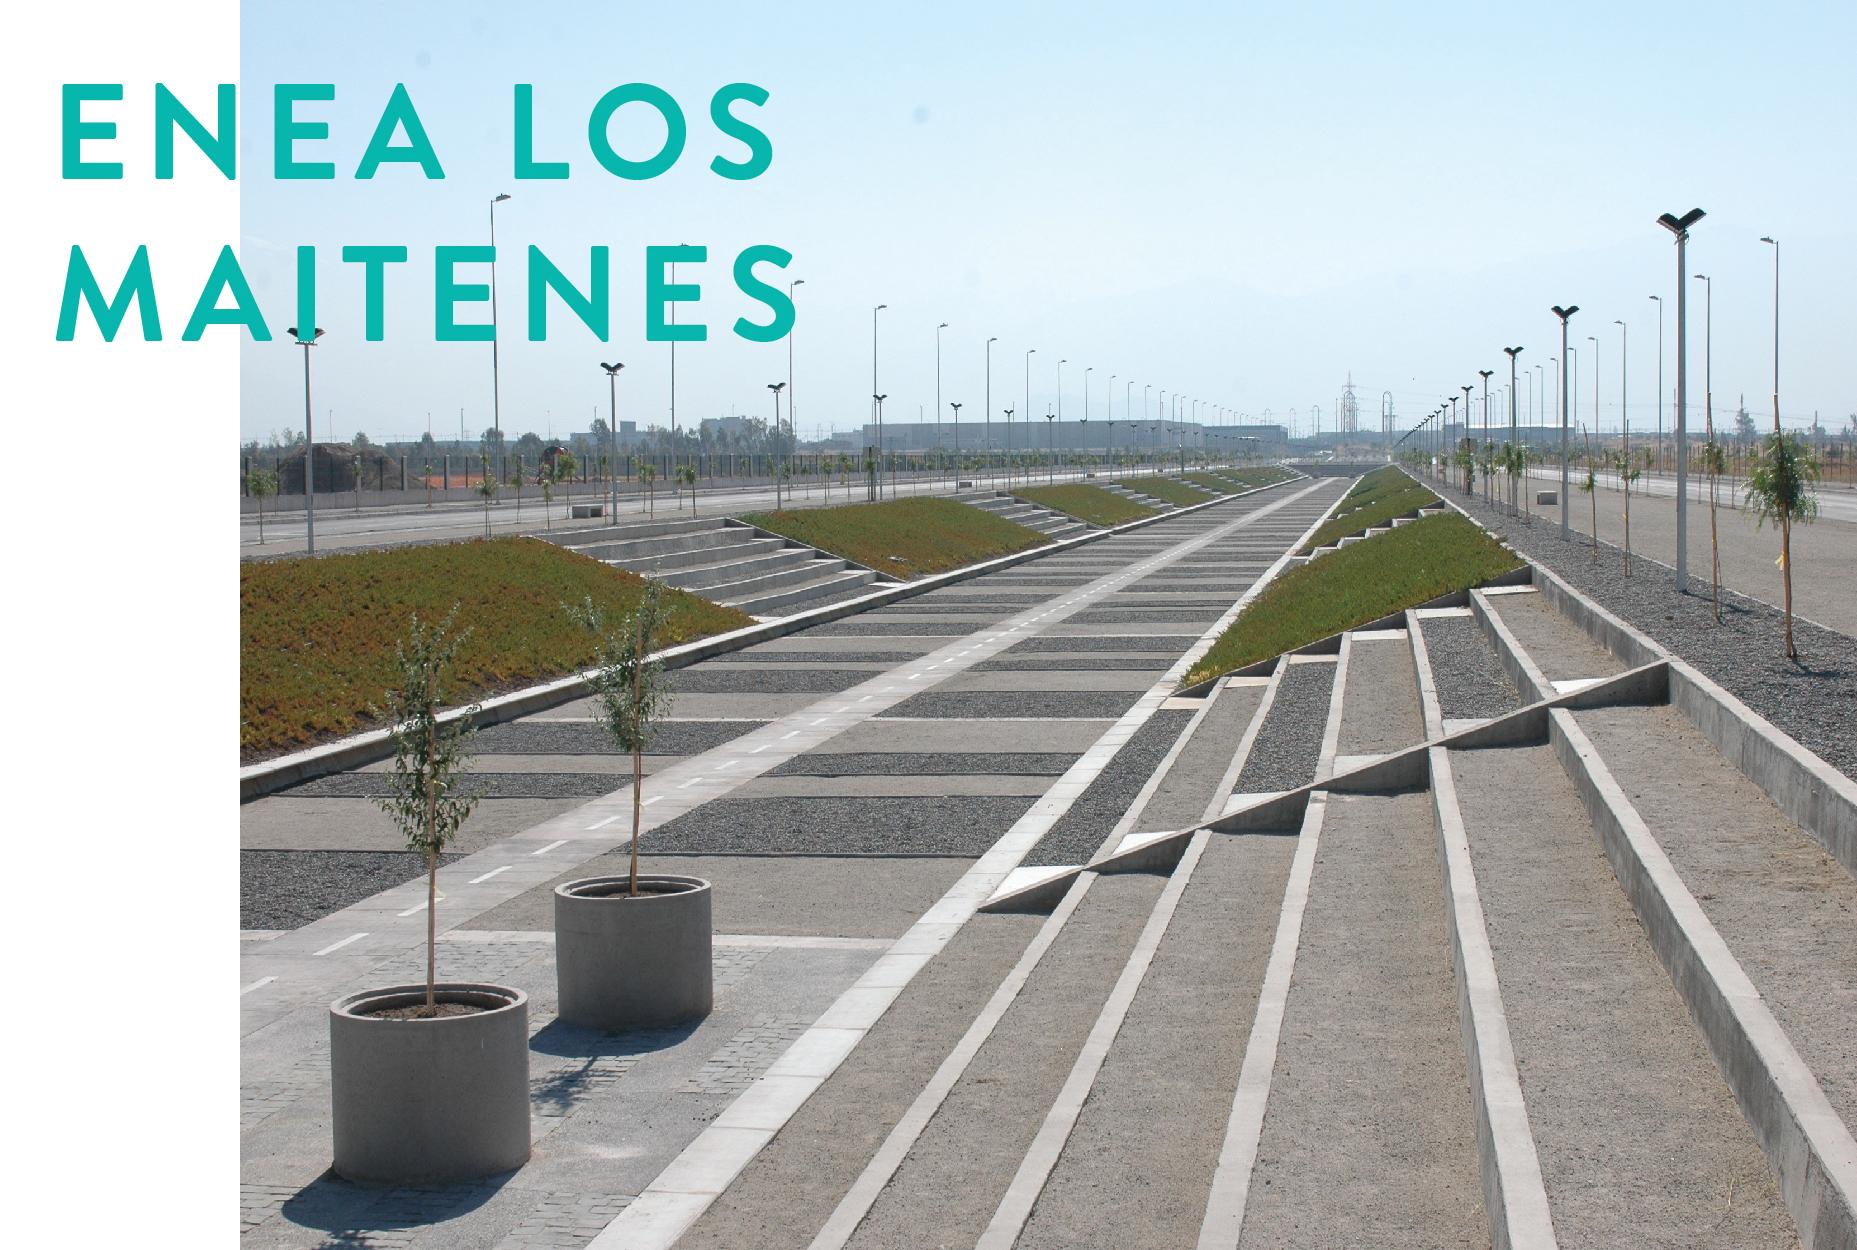 Formato Panoramico ENEA LOS MAITENES-01.jpg